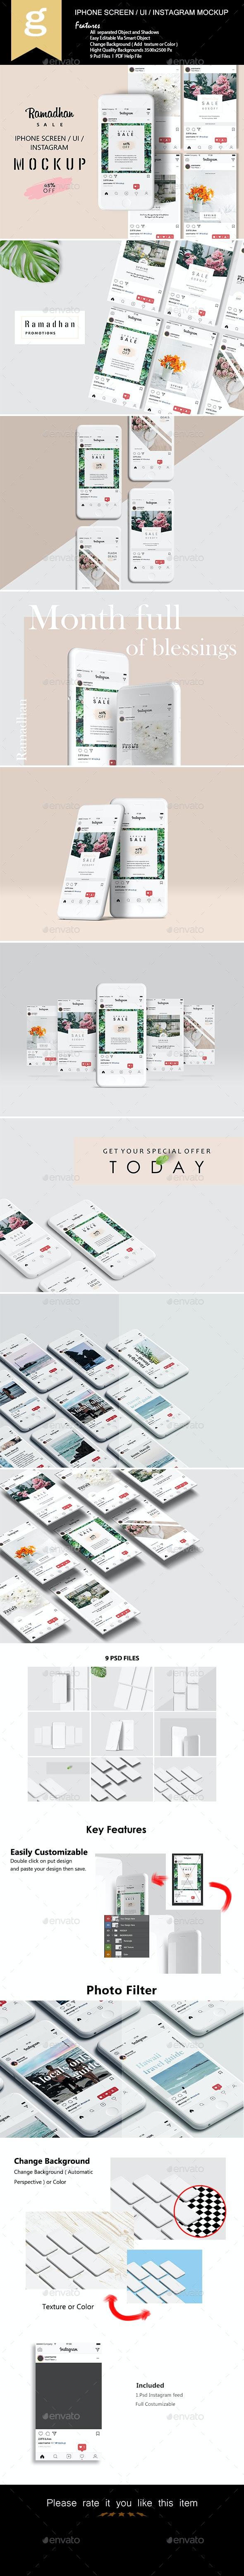 Phone Screen / UI / Instagram Mock-Up - Mobile Displays